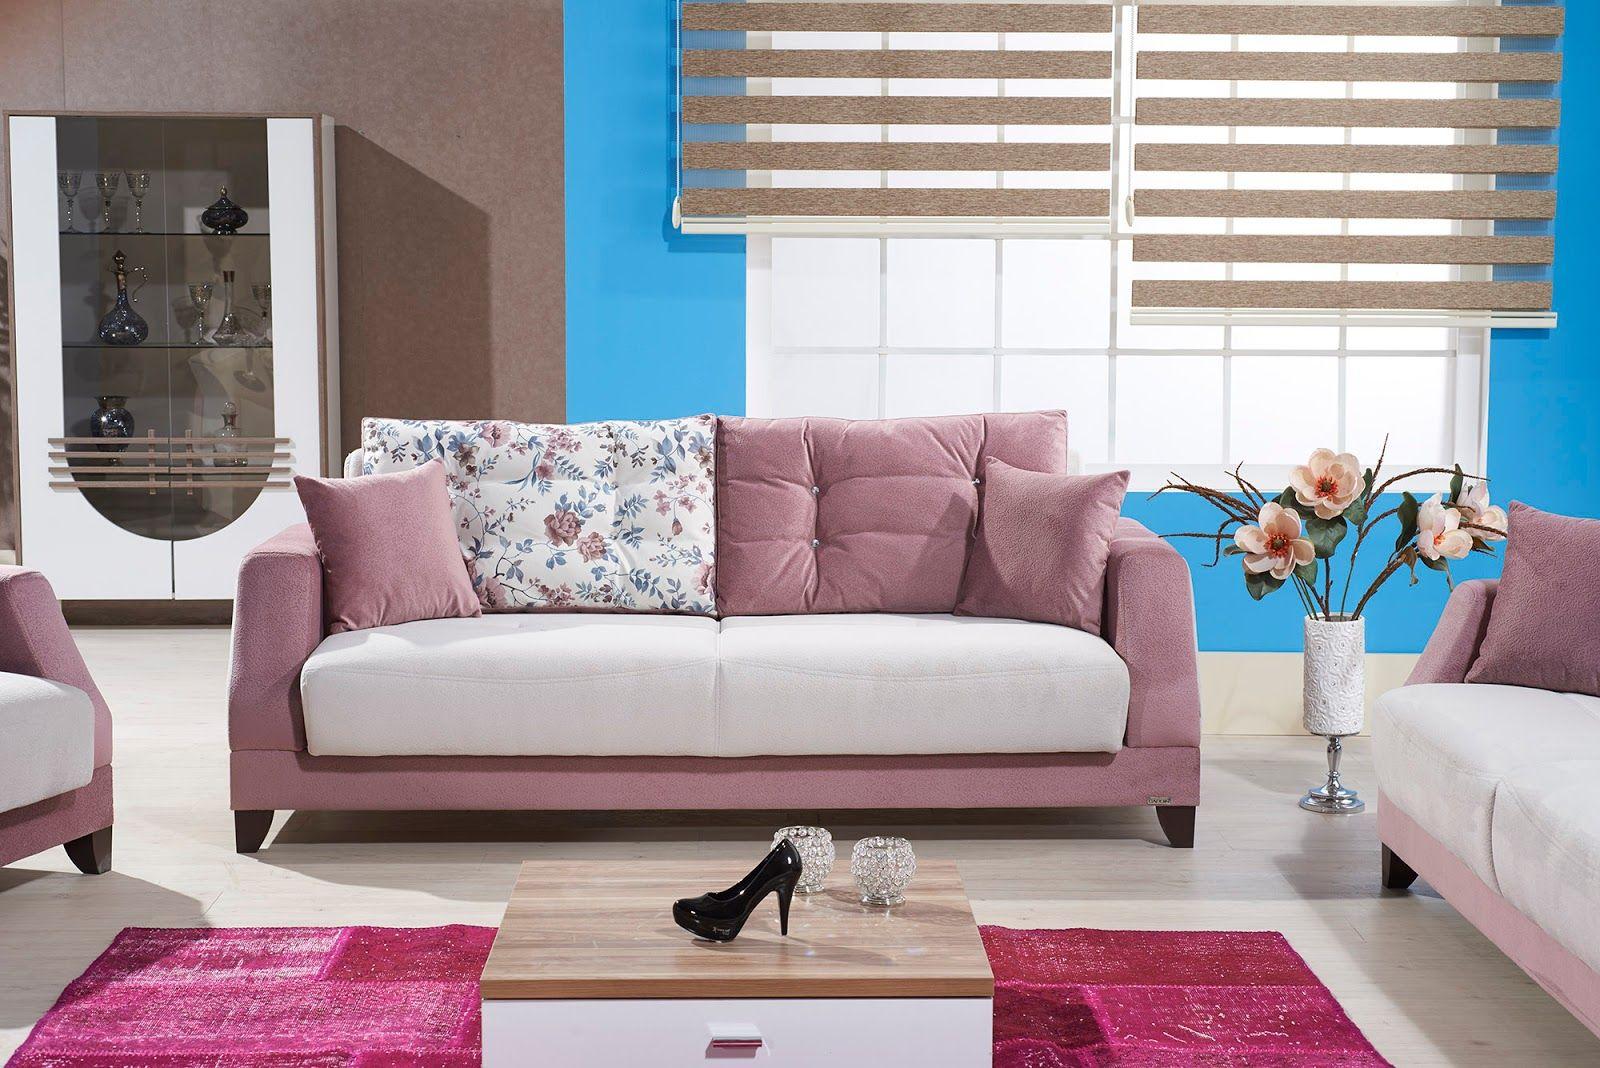 انتريهات مودرن 2019 حديثة بالصور Bedroom Styles Luxury Furniture Furniture